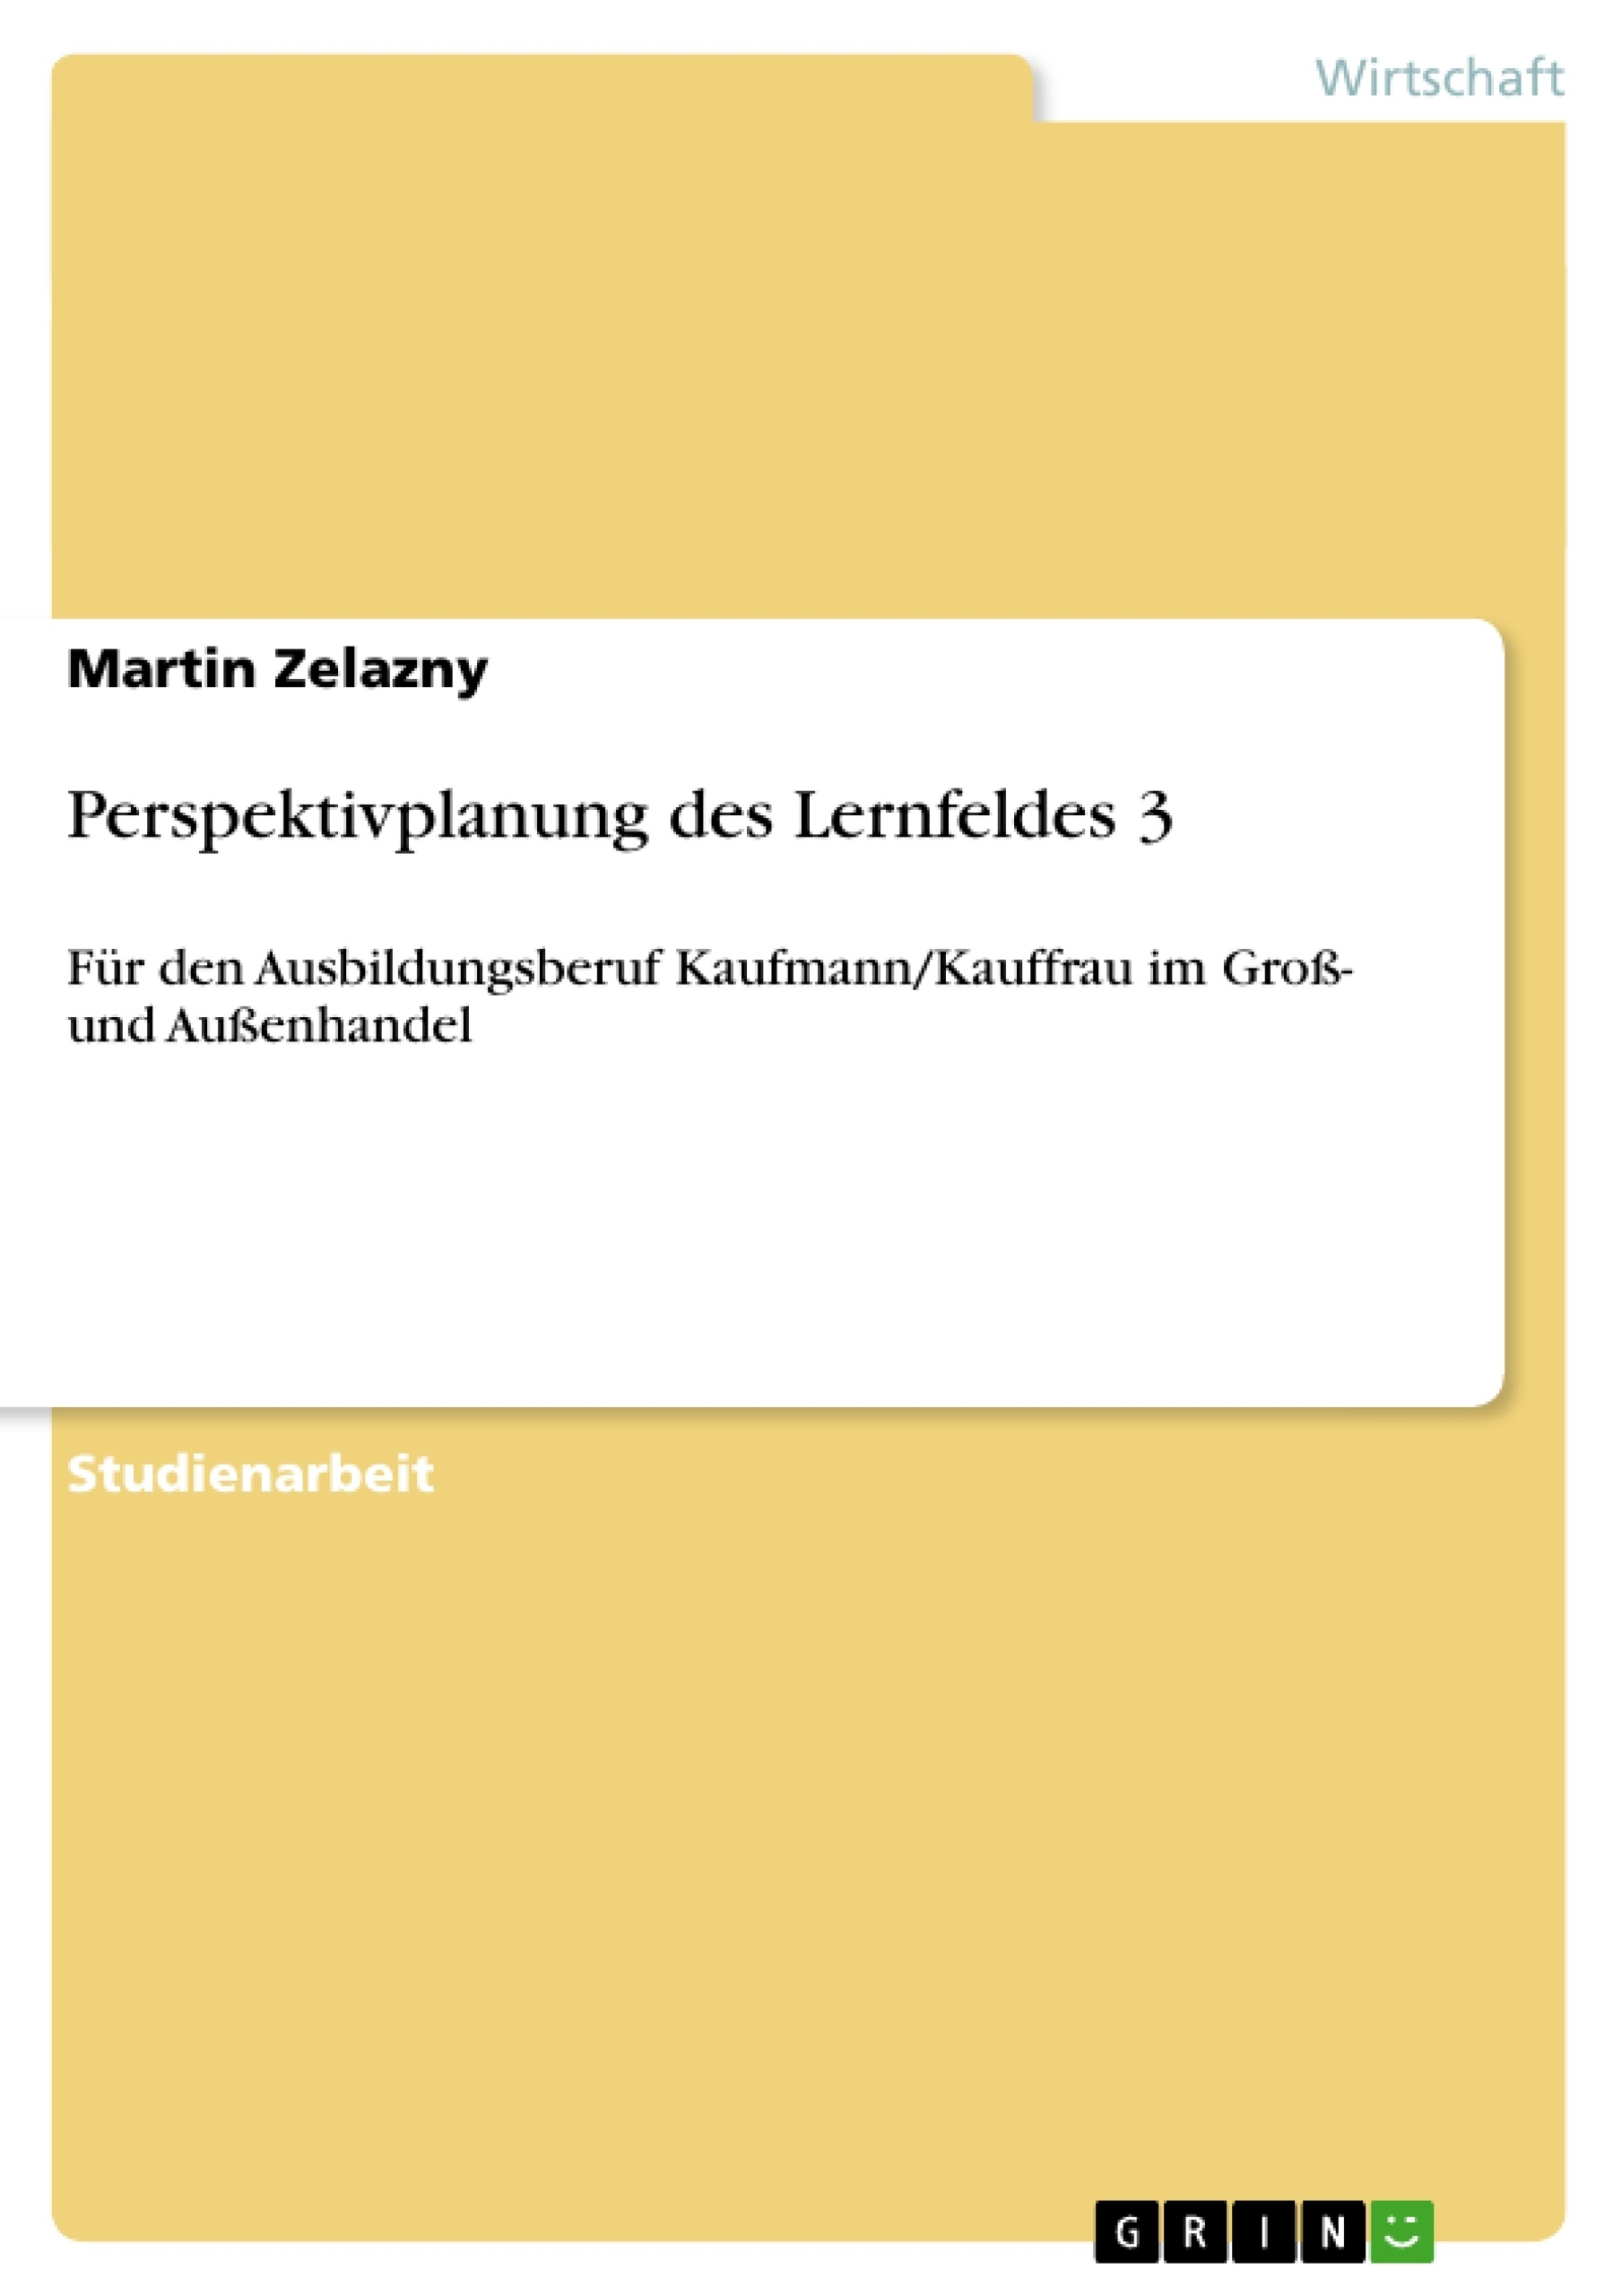 Titel: Perspektivplanung des Lernfeldes 3